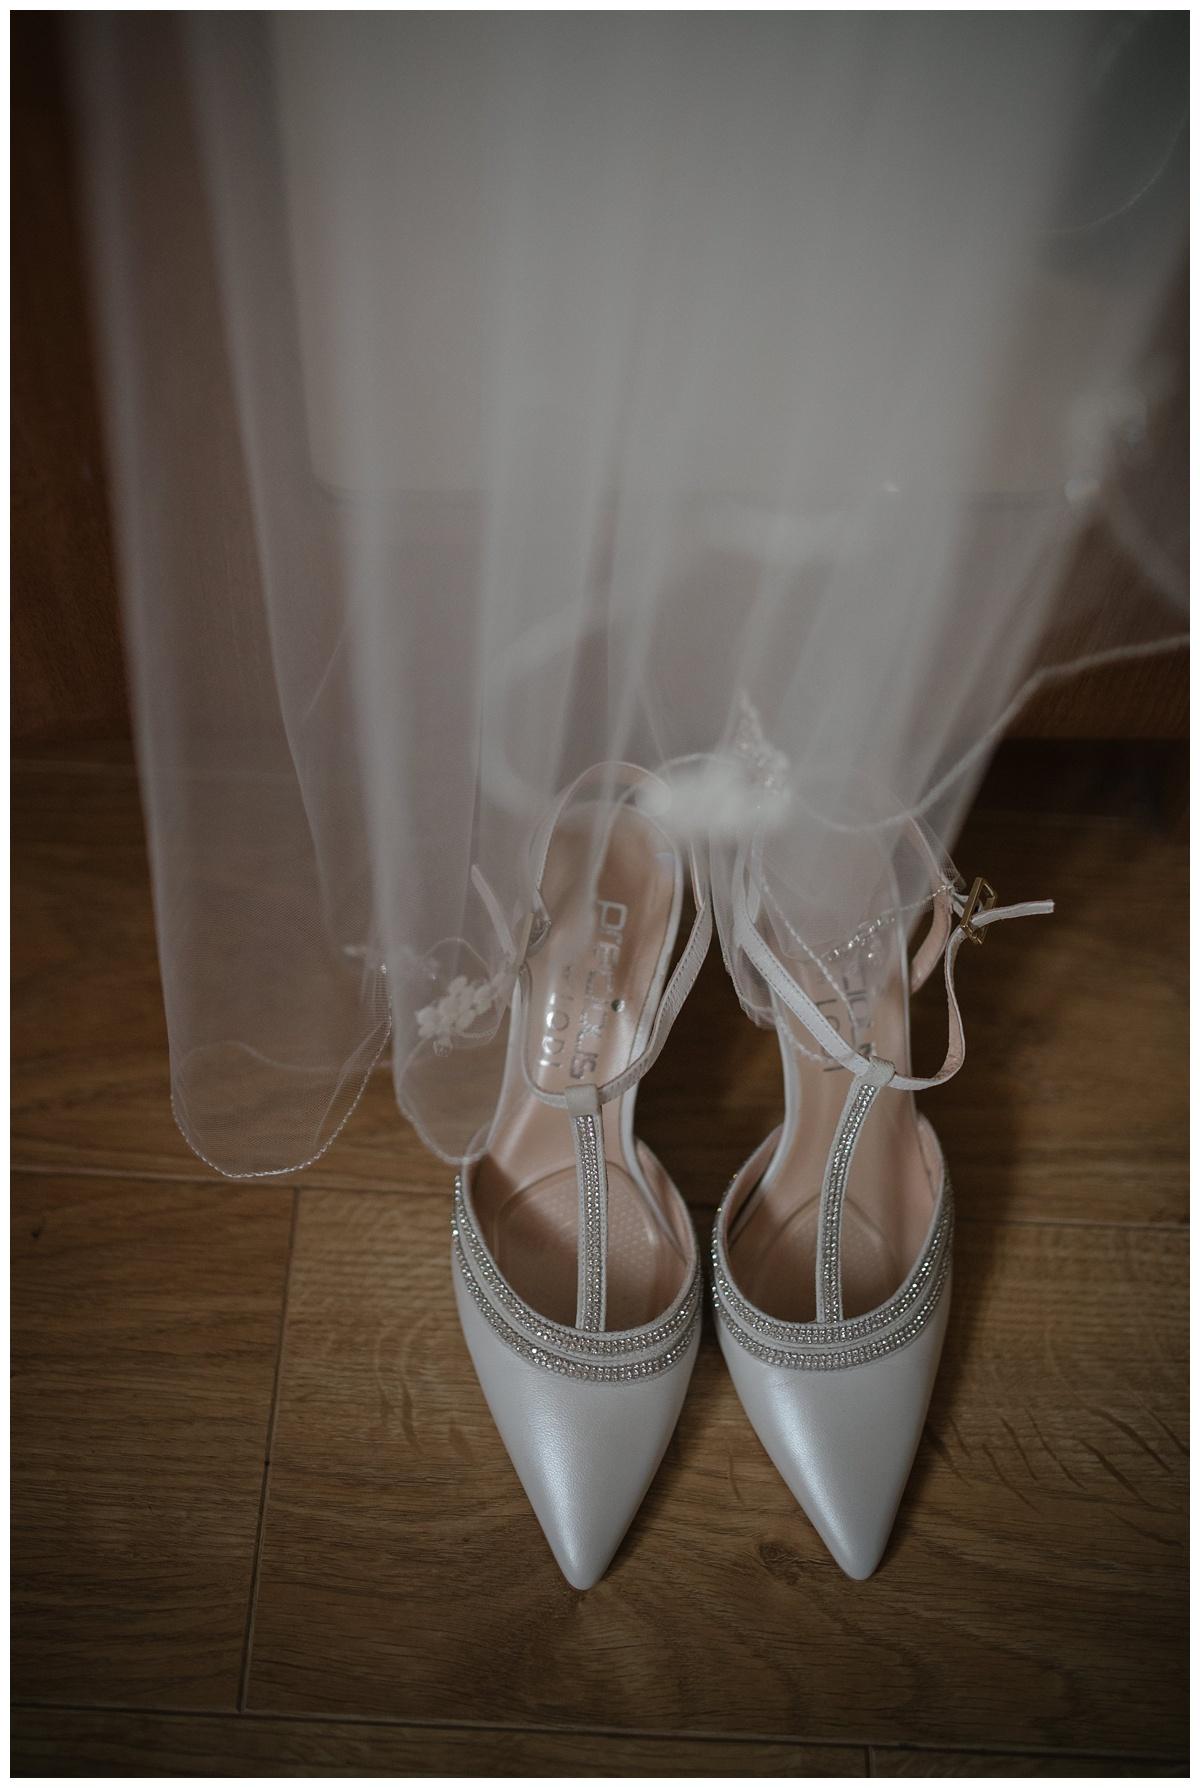 una_paul_cavan_crystal_hotel_wedding_jude_browne_photography_0004.jpg